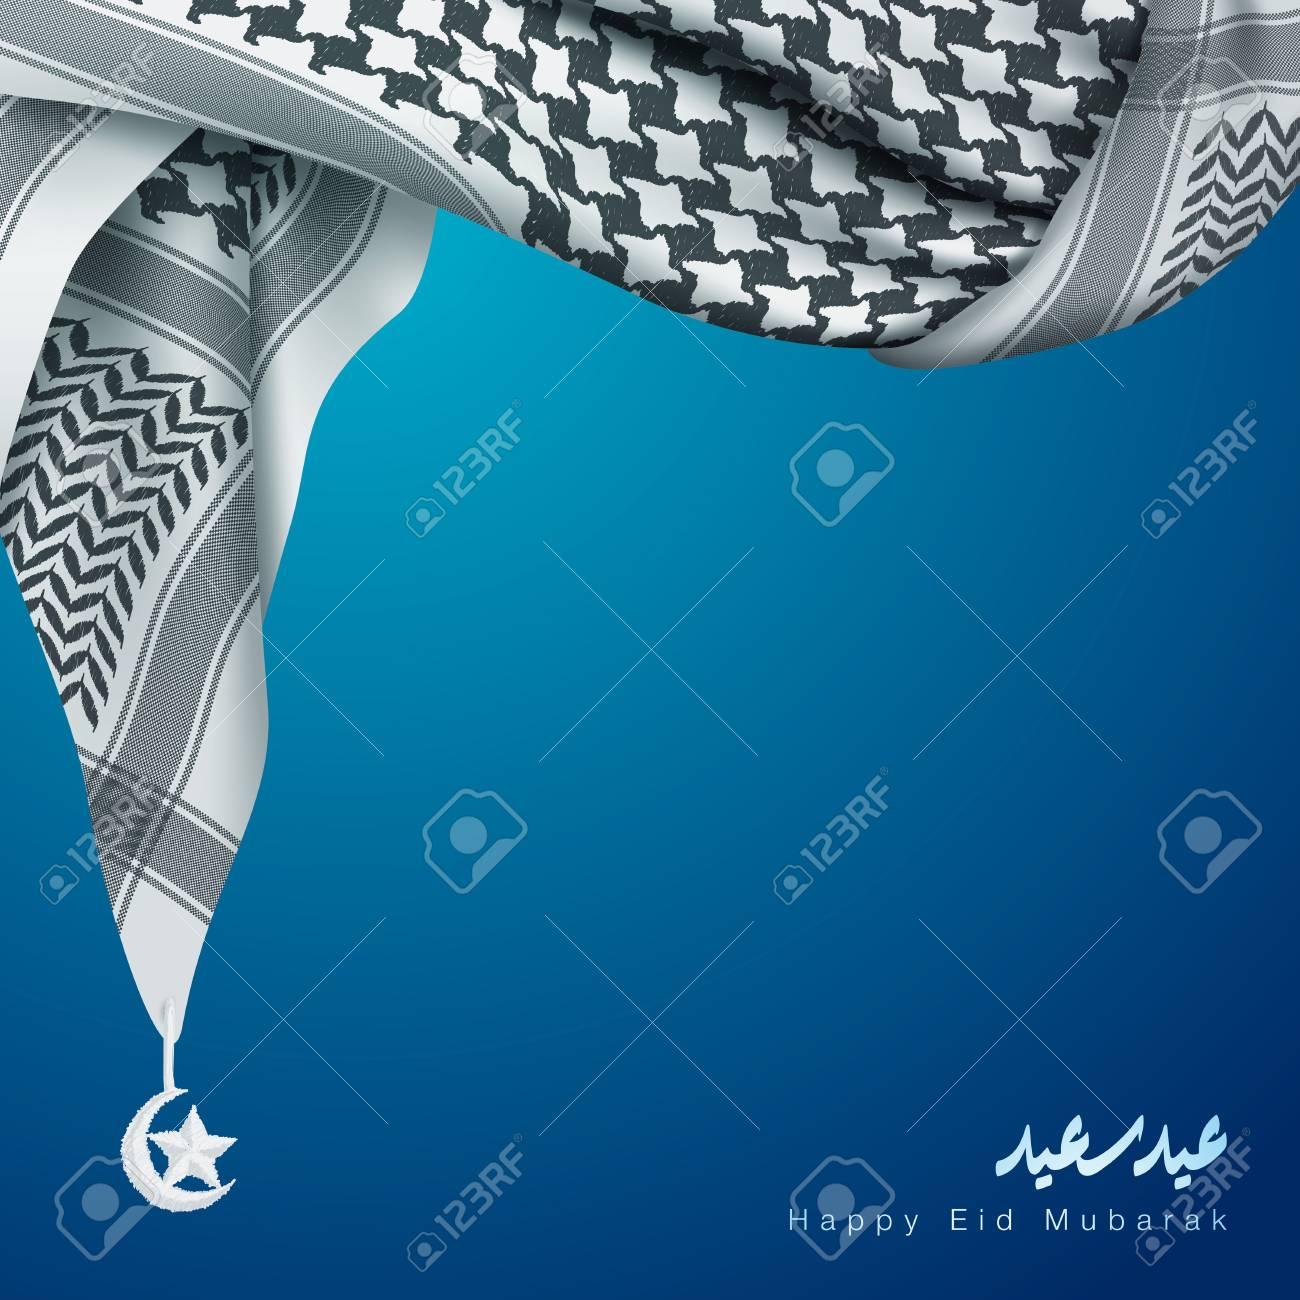 Happy eid mubarak greeting card template islamic design realistic happy eid mubarak greeting card template islamic design realistic arabic scarf stock vector 106706163 m4hsunfo